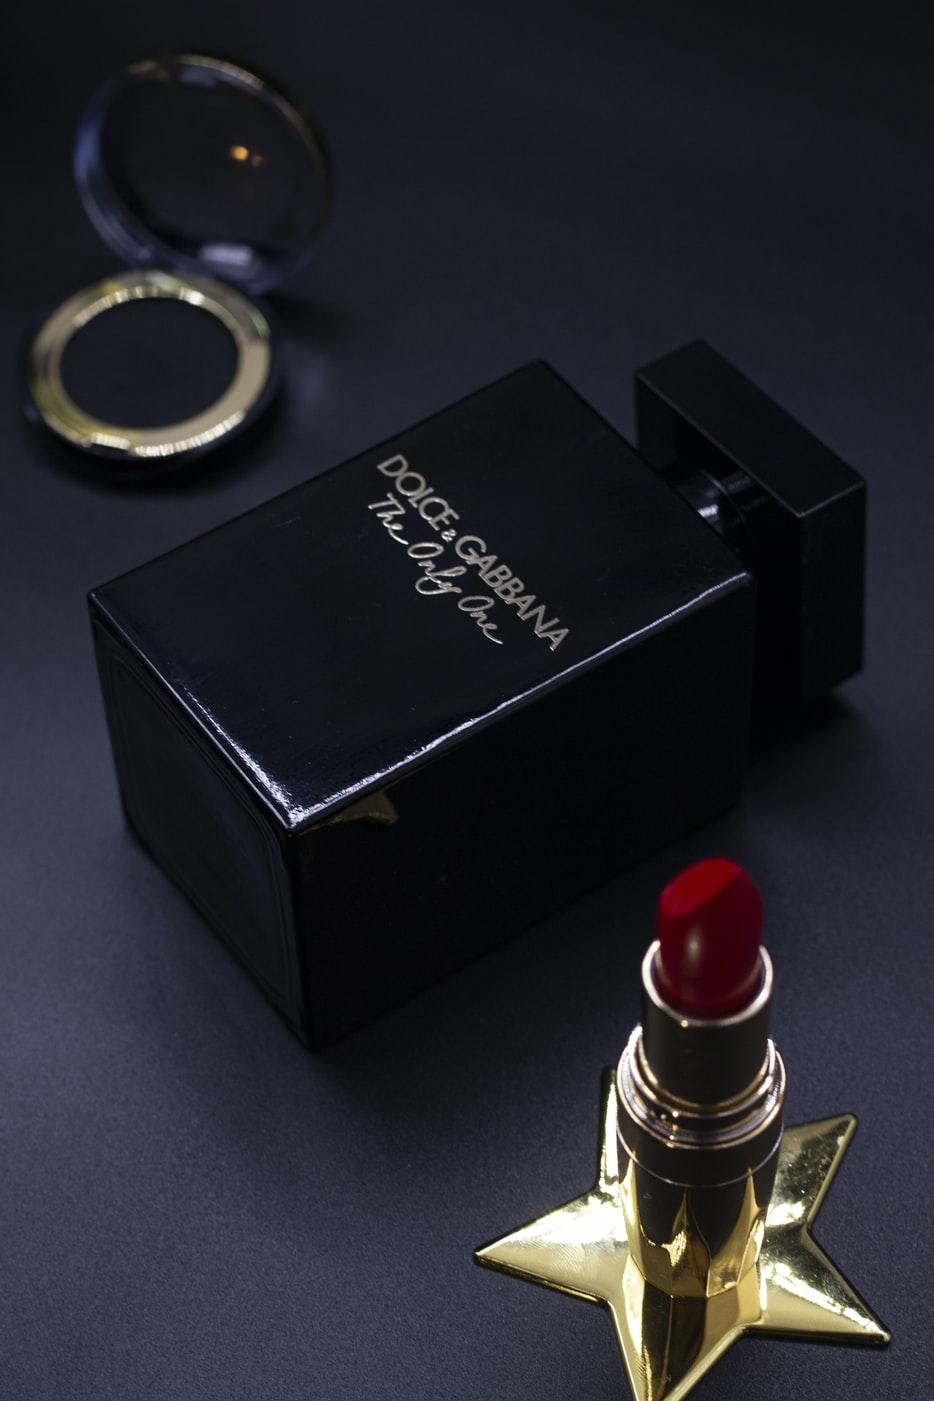 Dolce & Gabbana product